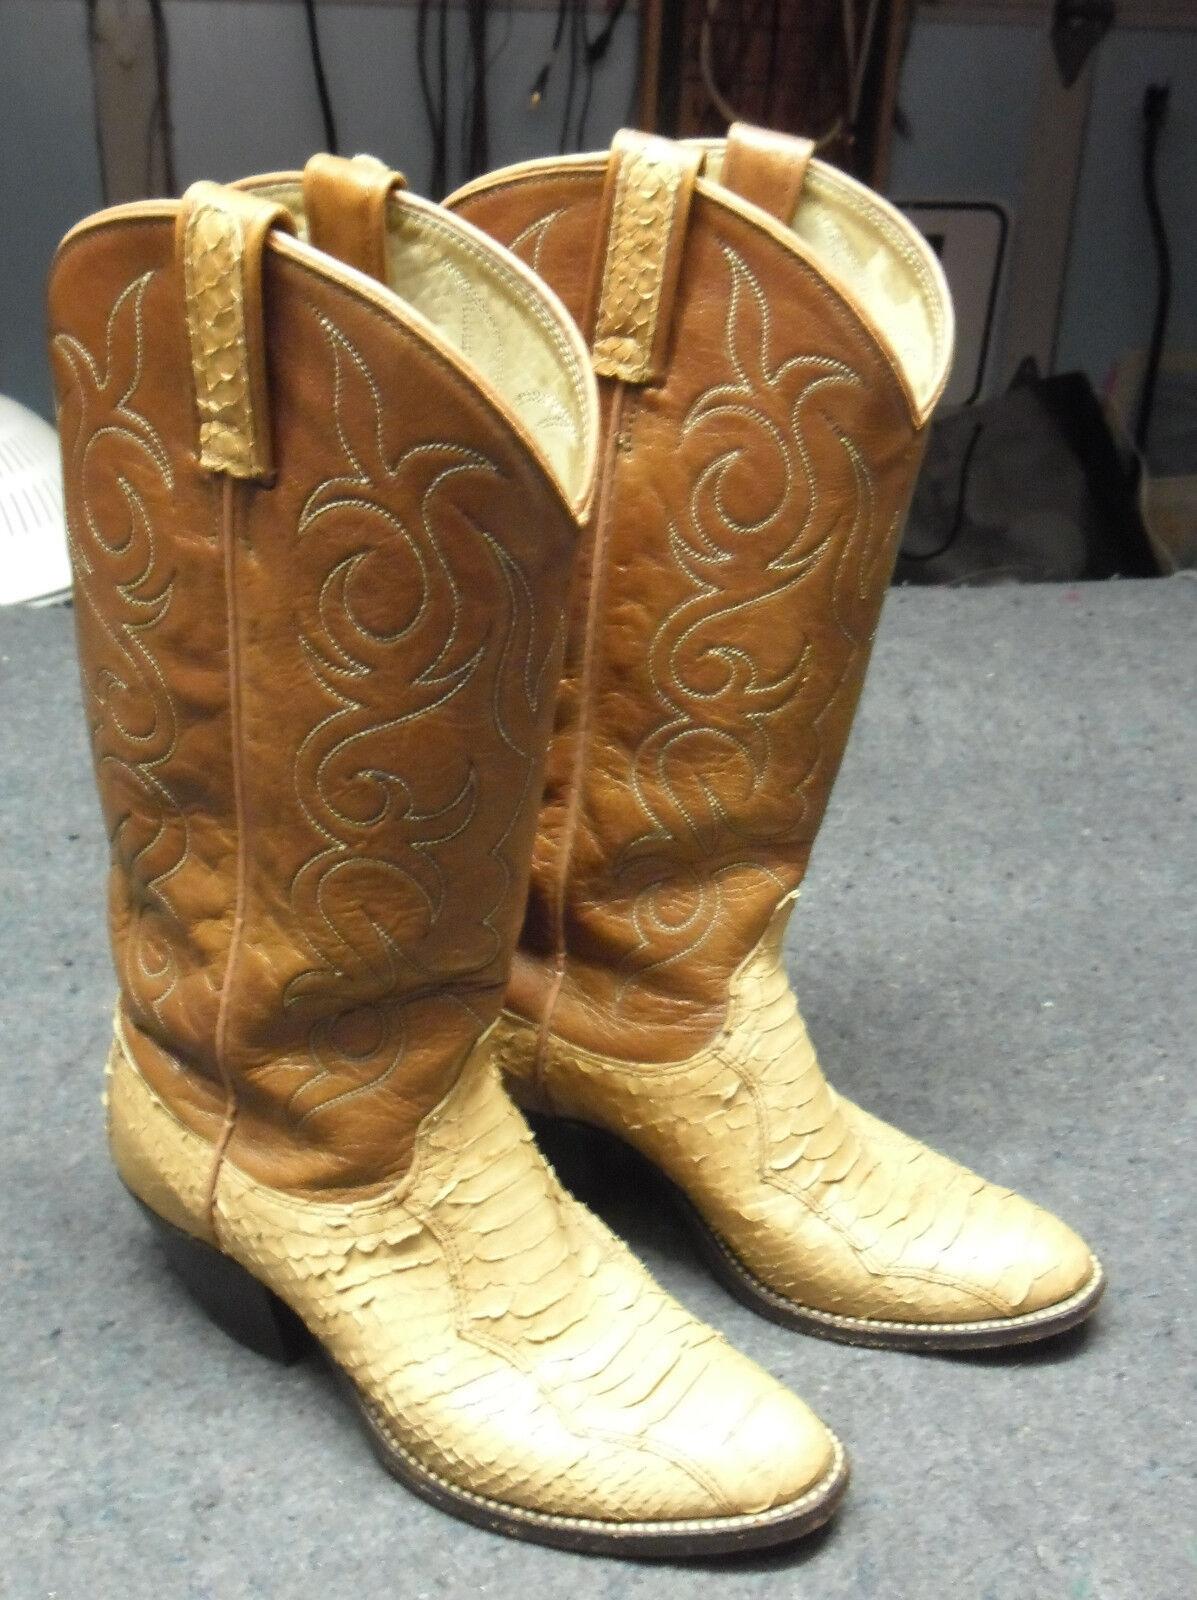 WOMEN'S DAN POST 2-tone BROWN LEATHER SNAKESKIN WESTERN COWBOY BOOTS  SZ 6 1 2 C